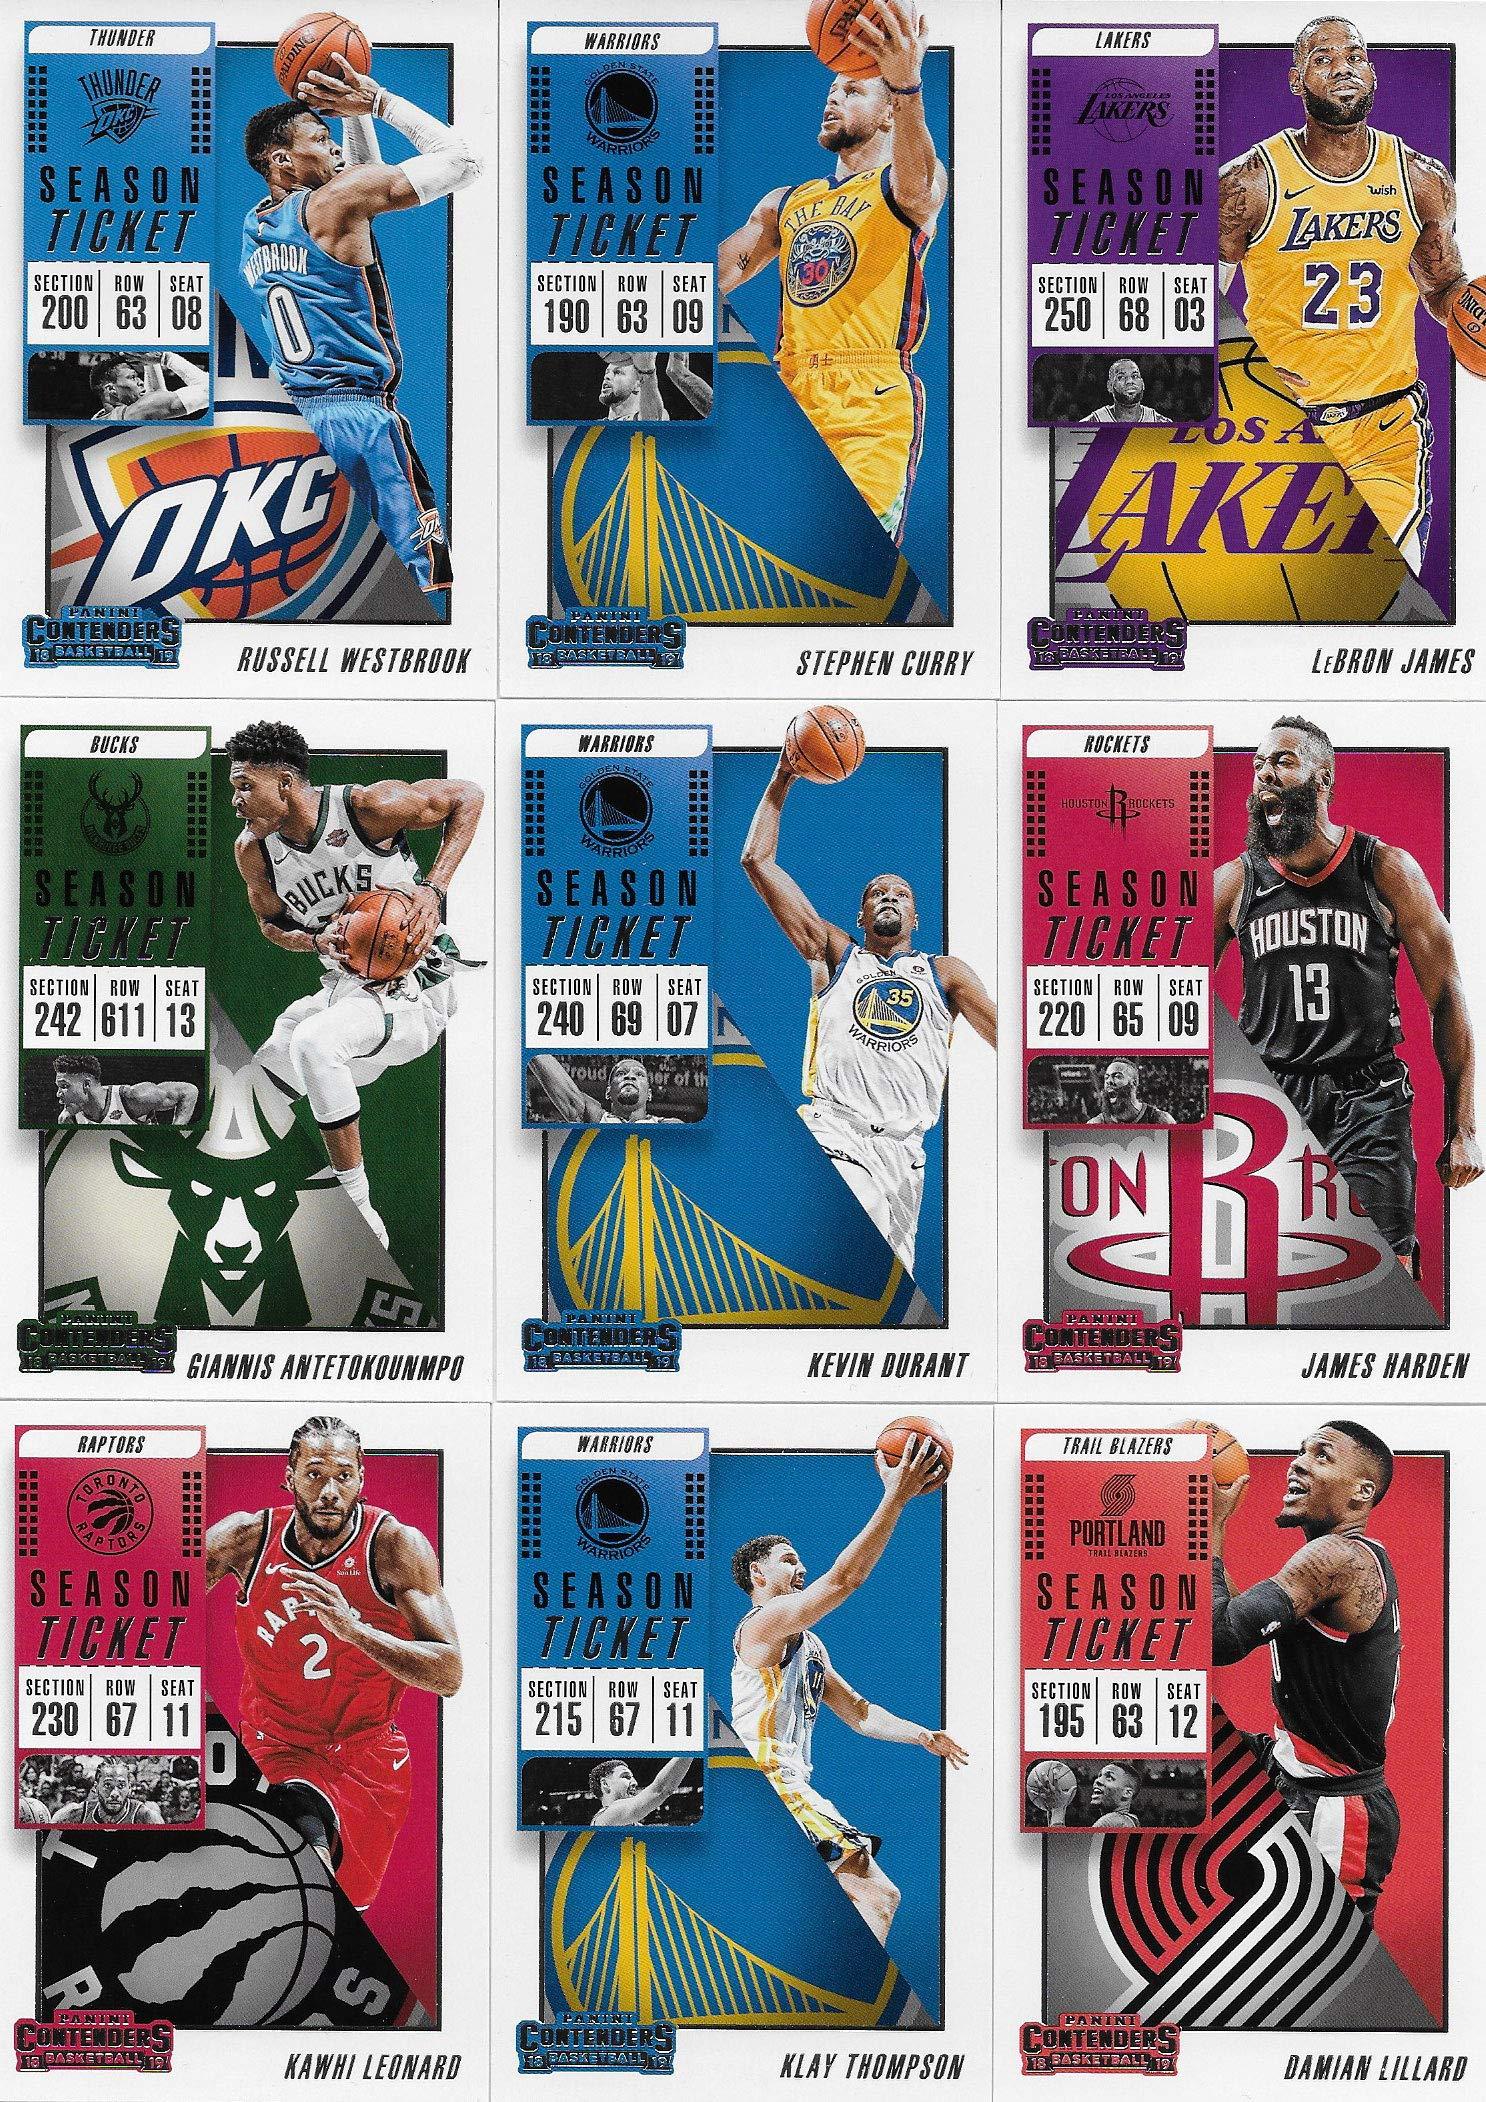 2018 2019 Panini Contenders NBA Basketball Series